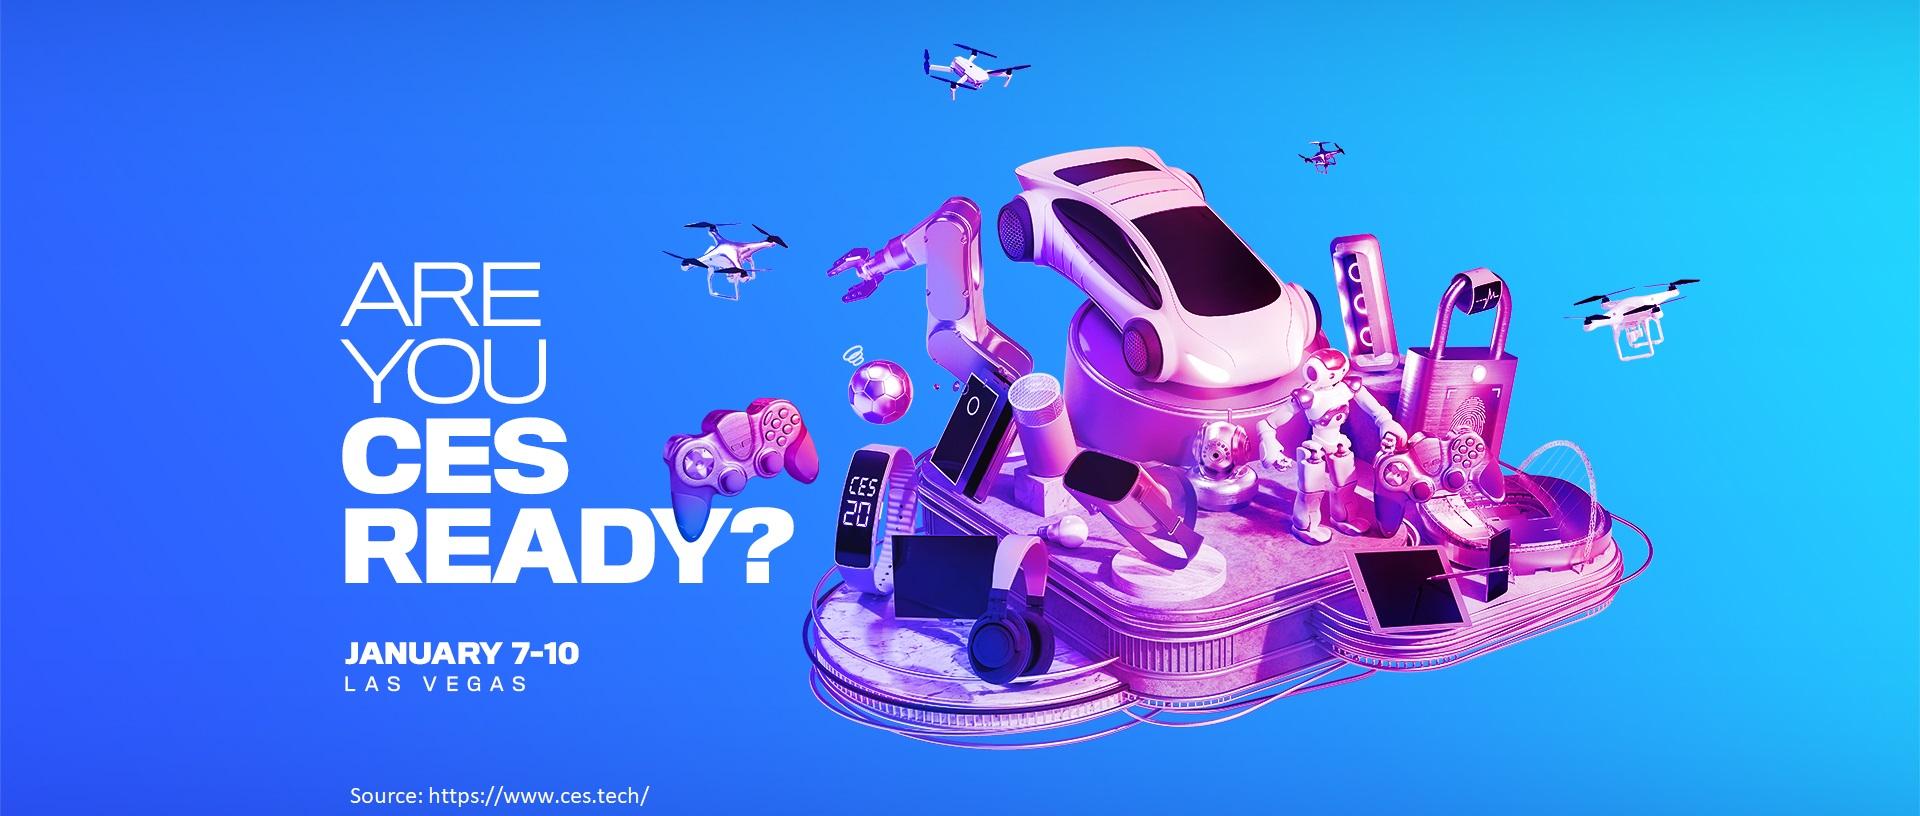 CES 2020 LOGO Site